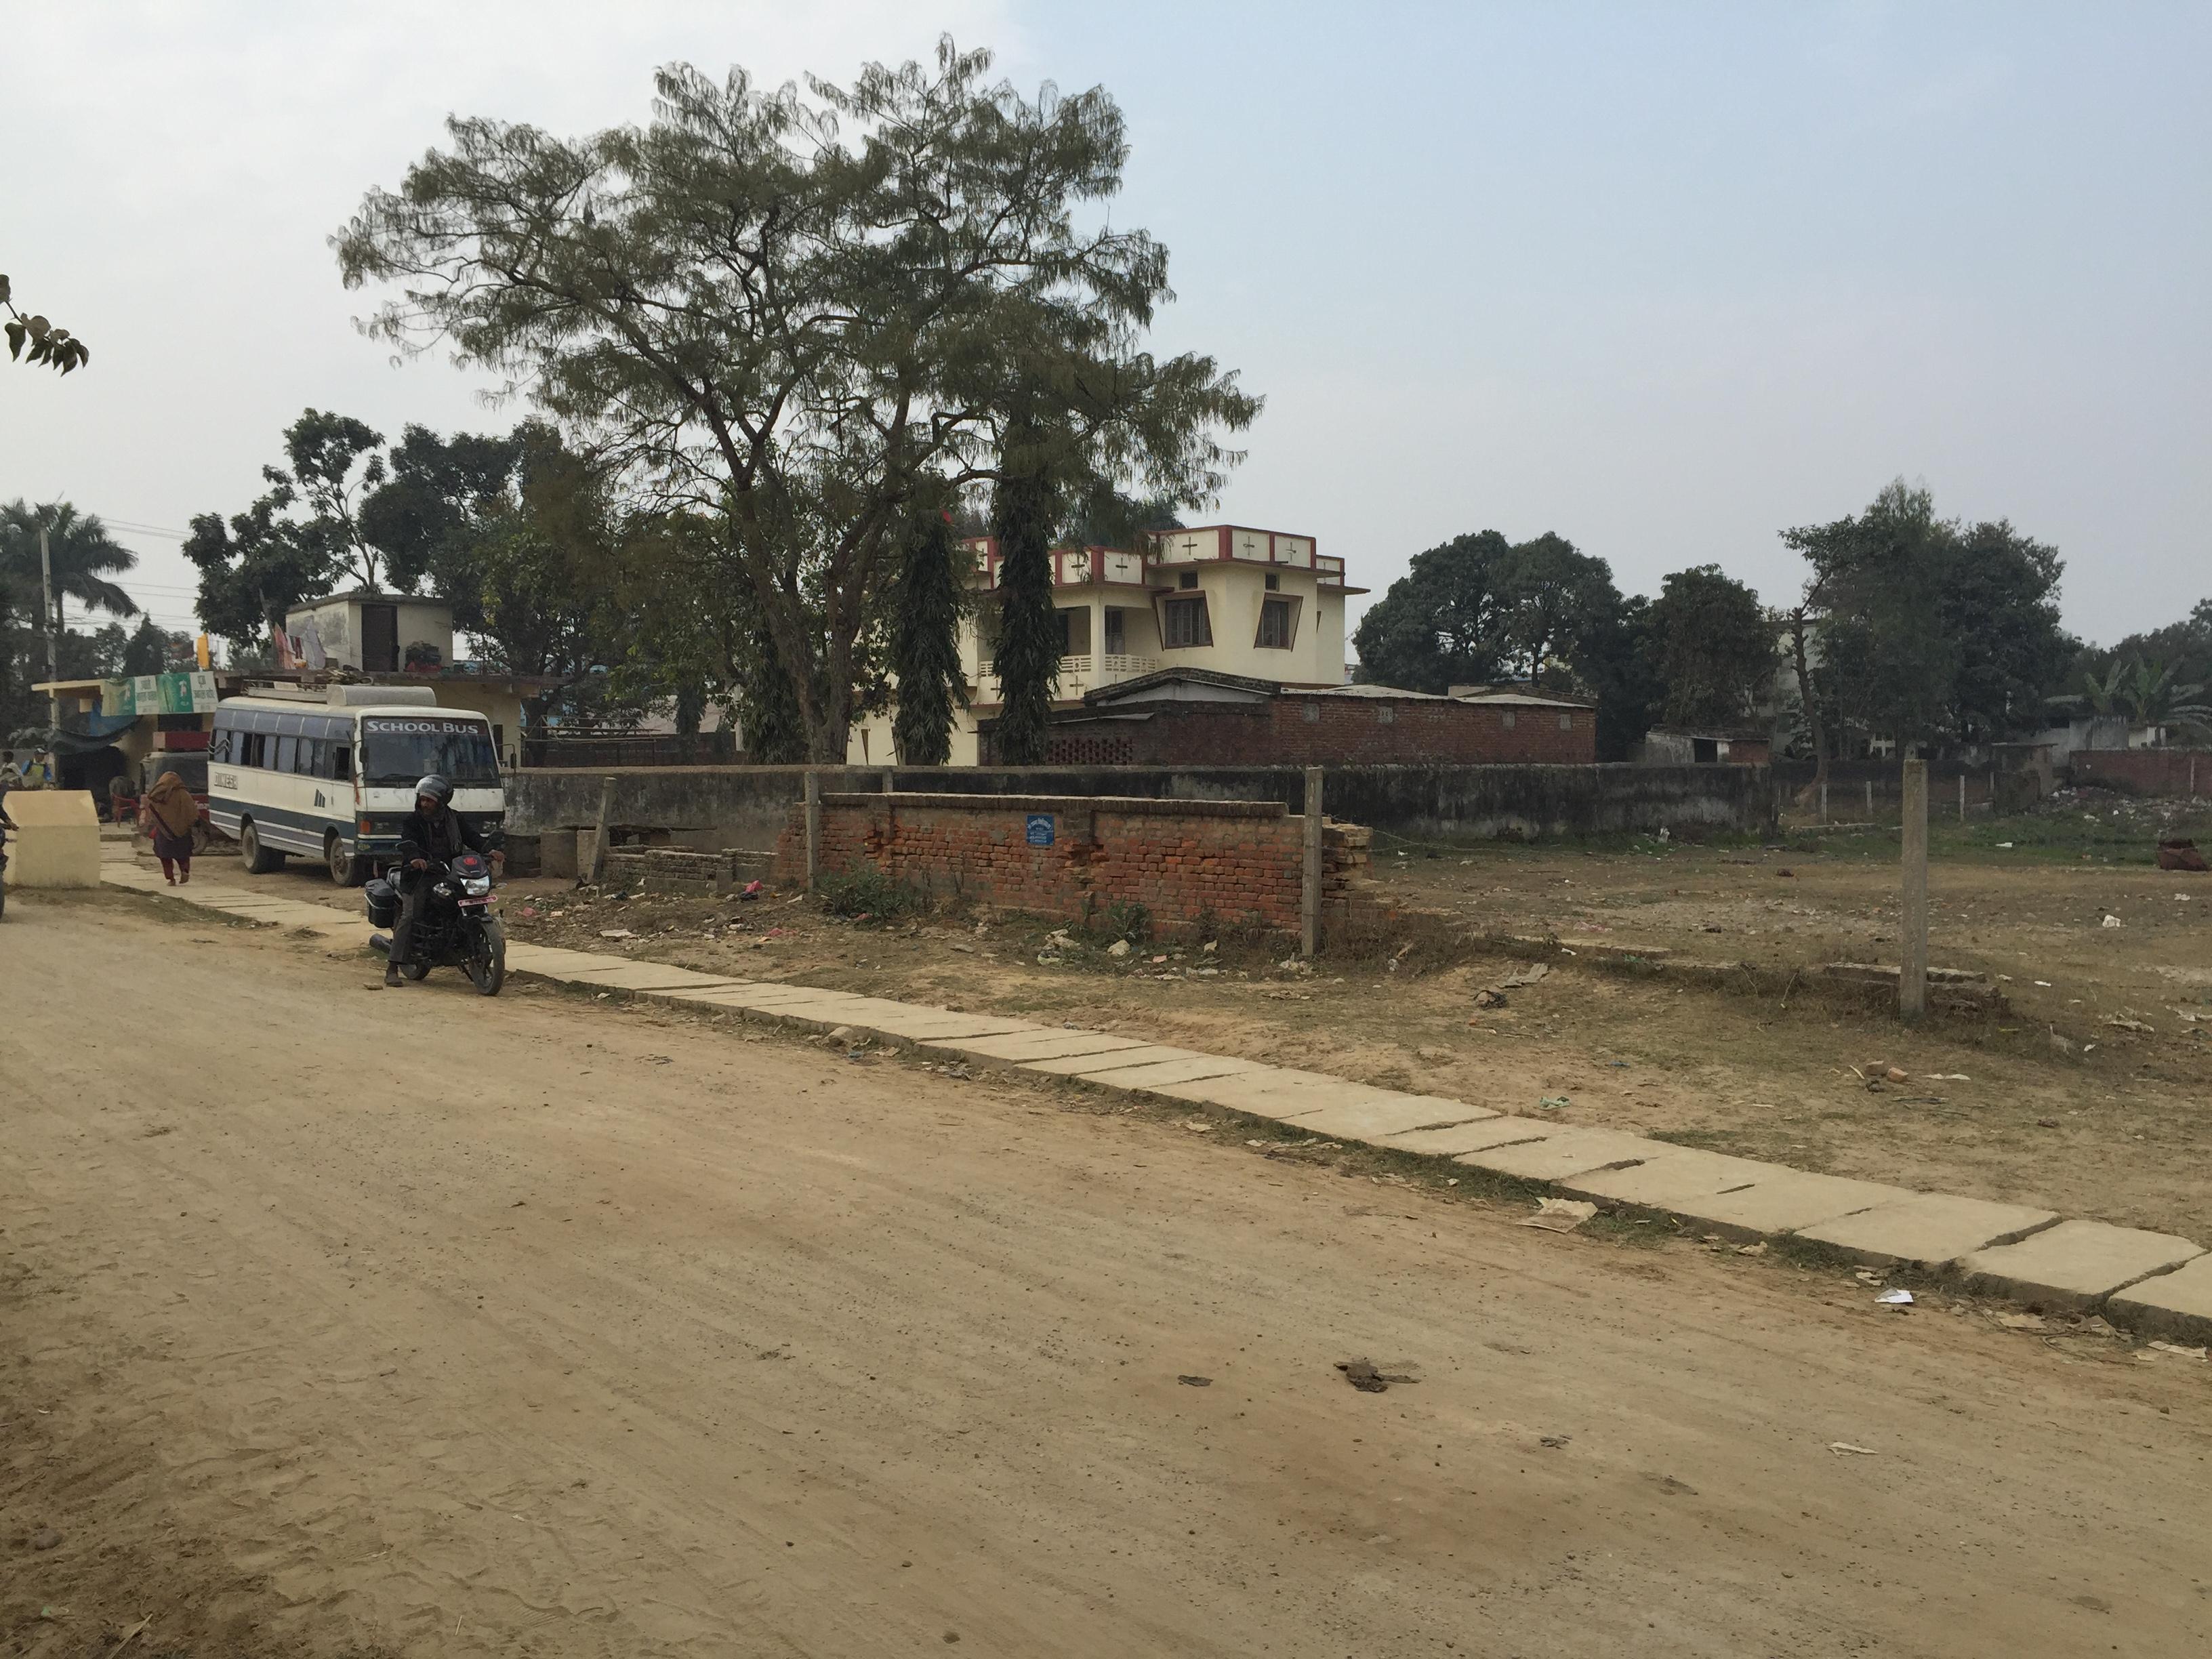 Large Plot available for sale in Banke Gaon, Nepalgunj – Banke – IMG_1975